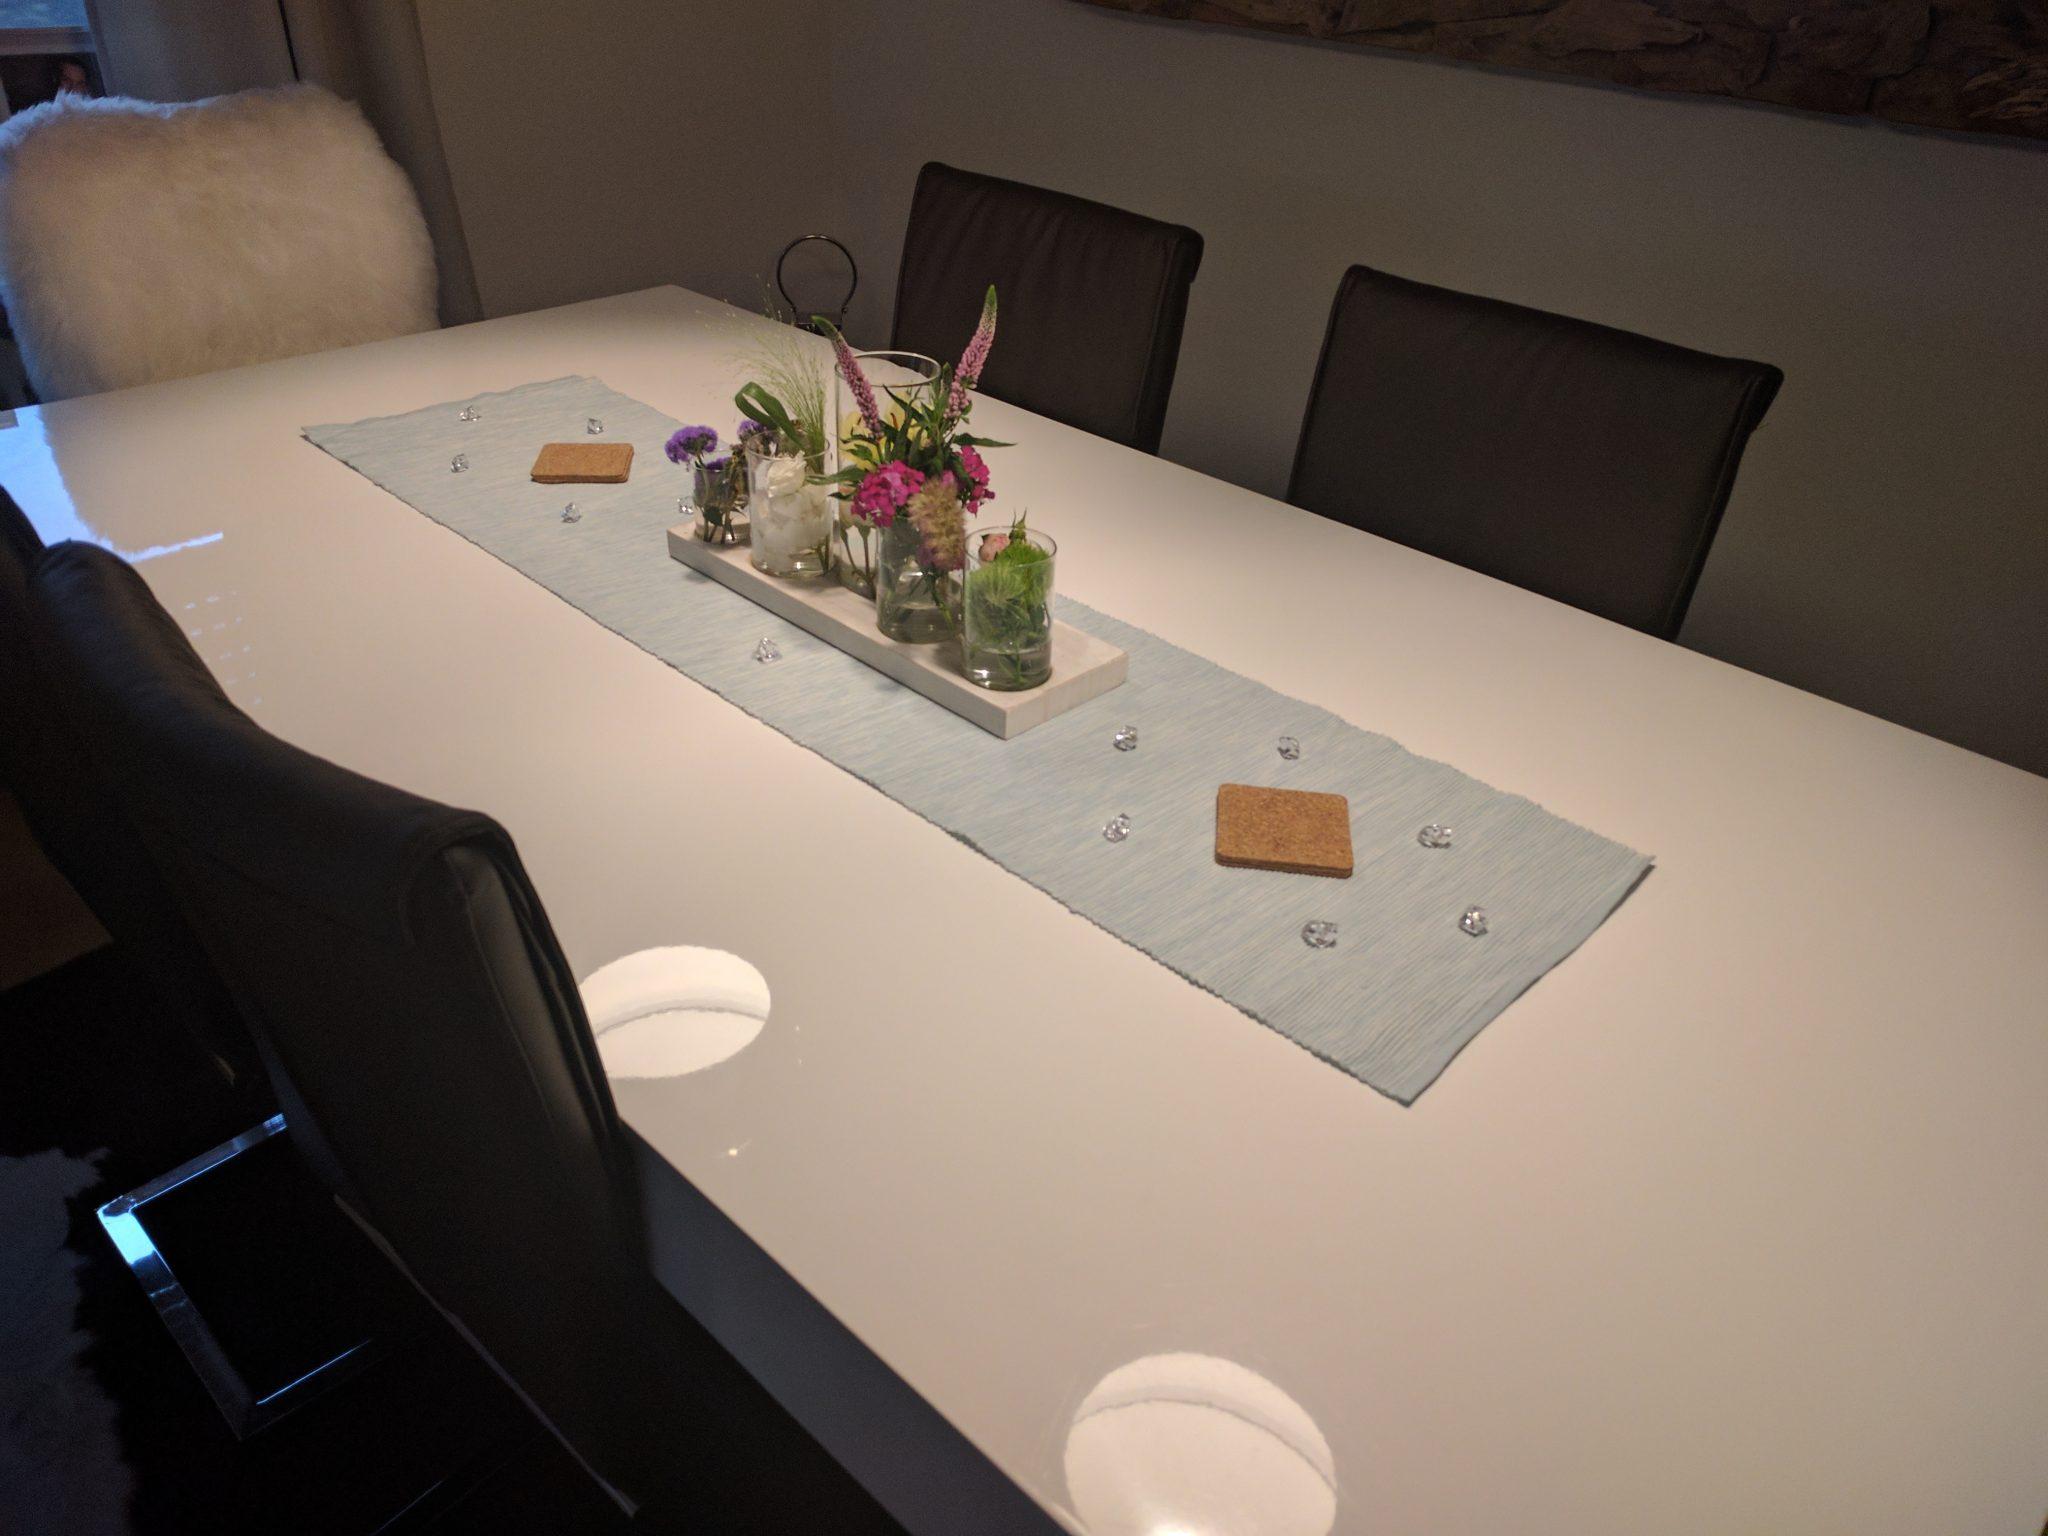 kleine diamanten treffen auf fr hling homes and lifestyle blog. Black Bedroom Furniture Sets. Home Design Ideas